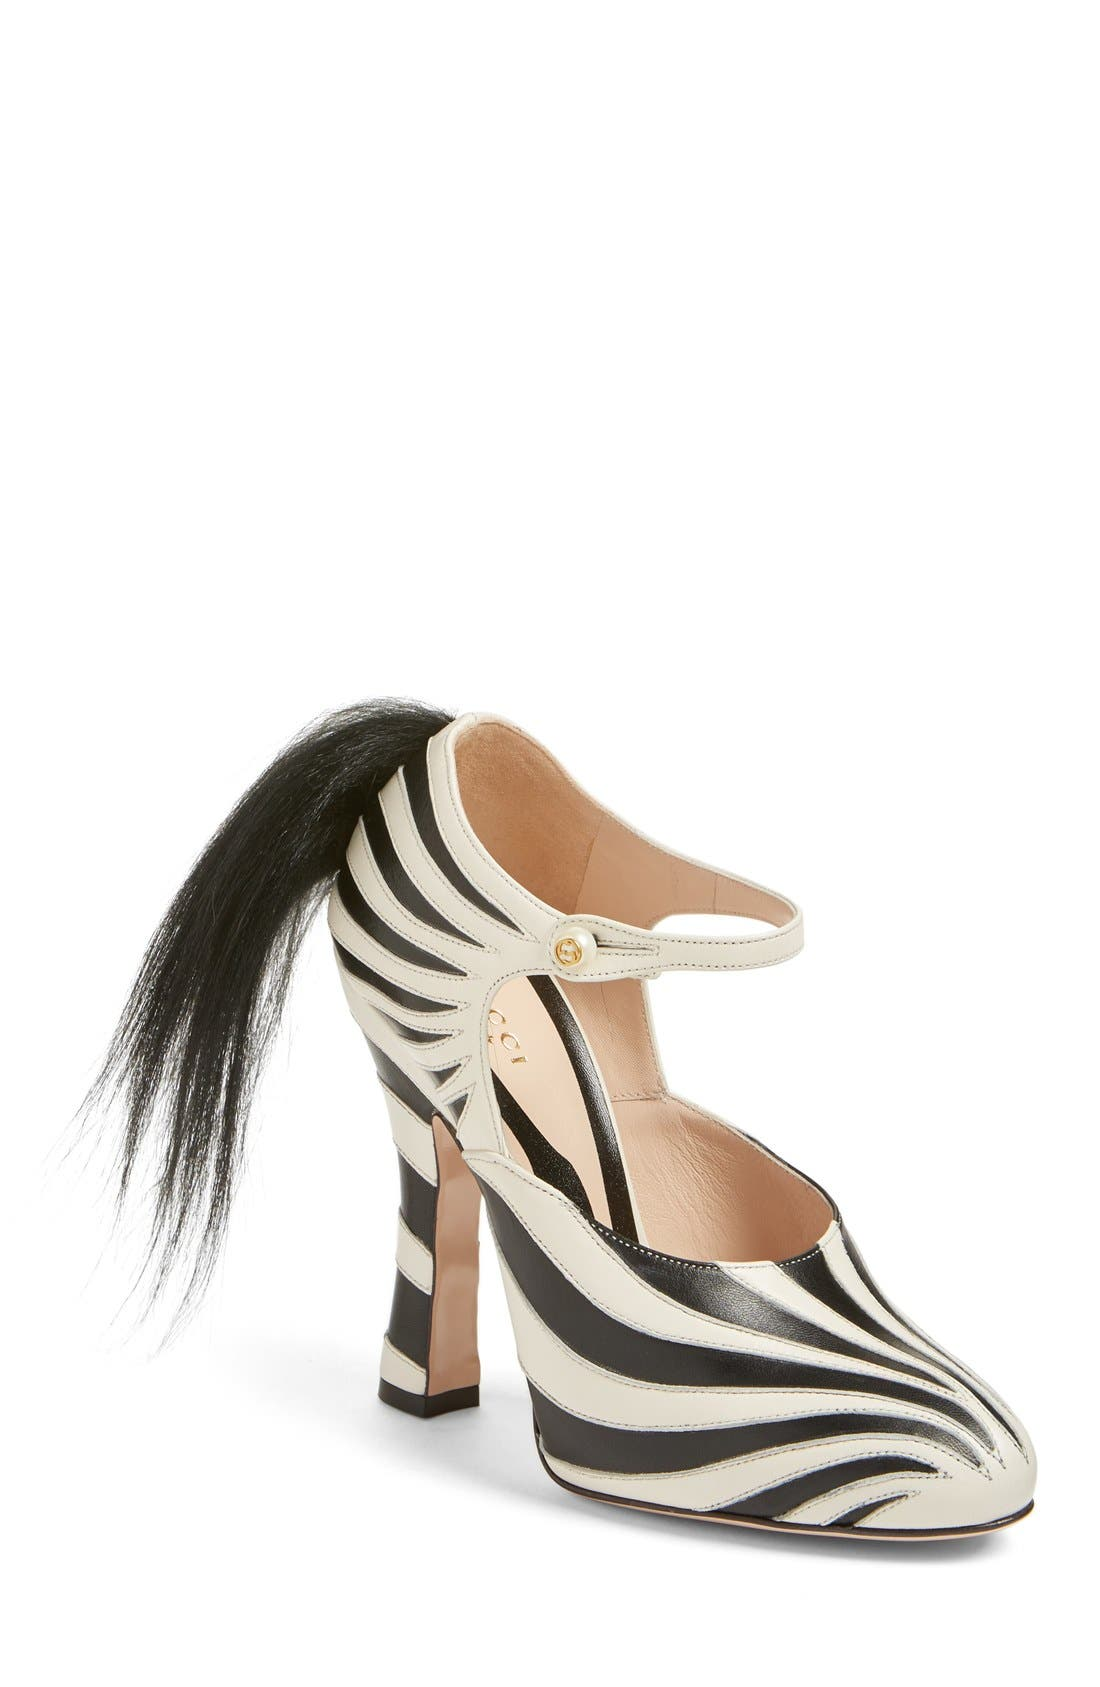 'Lesley' Zebra Stripe Pump,                             Main thumbnail 1, color,                             124